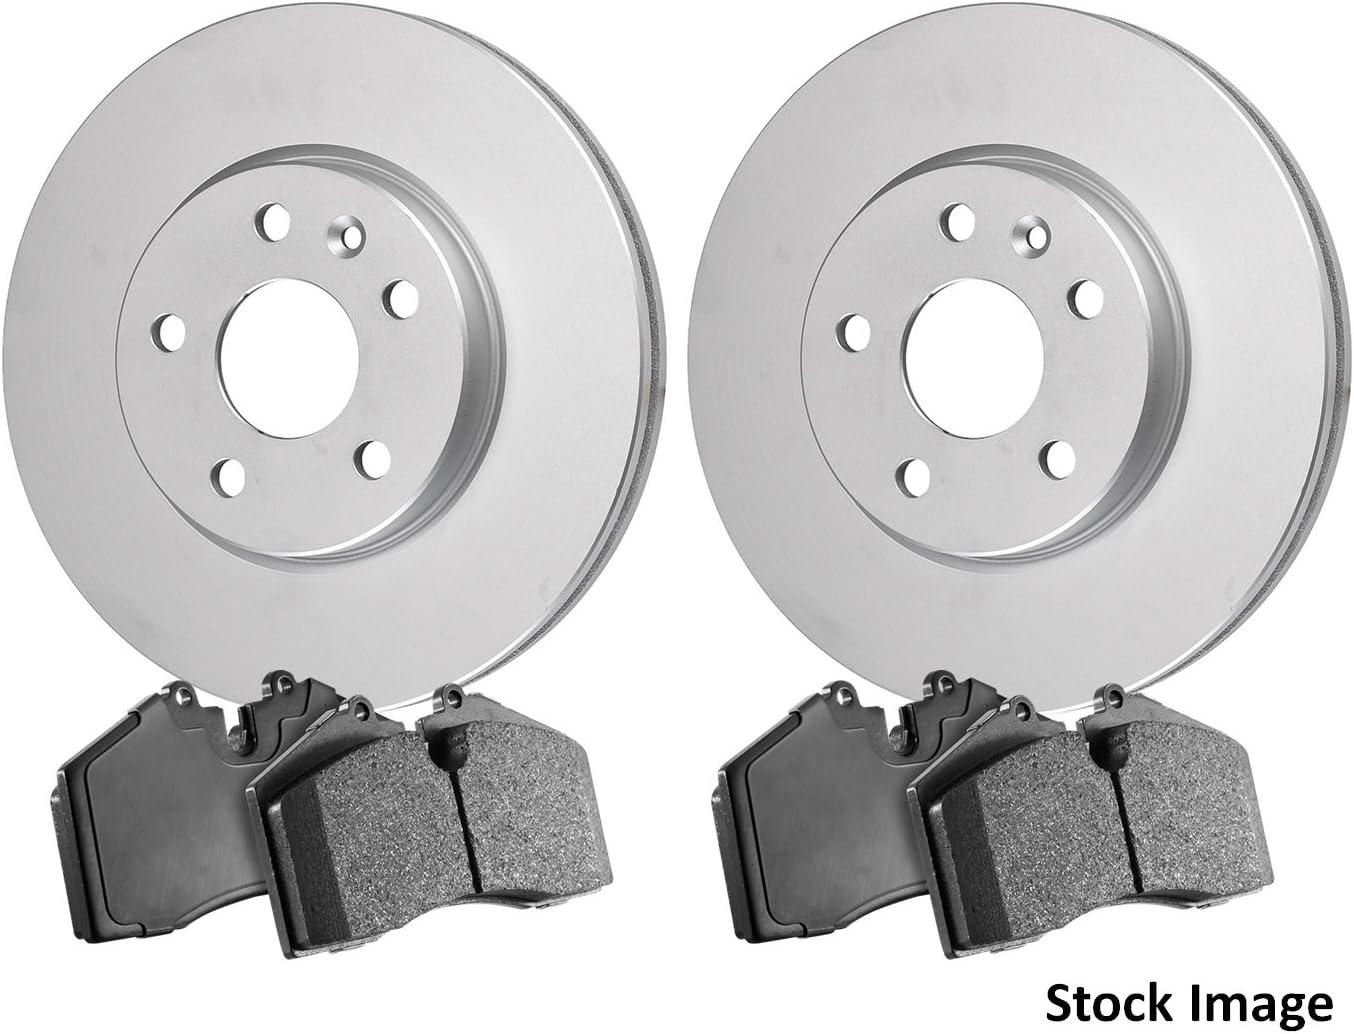 2013 For Mazda CX-5 Rear Anti Rust Coated Disc Brake Rotors and Ceramic Brake Pads Stirling